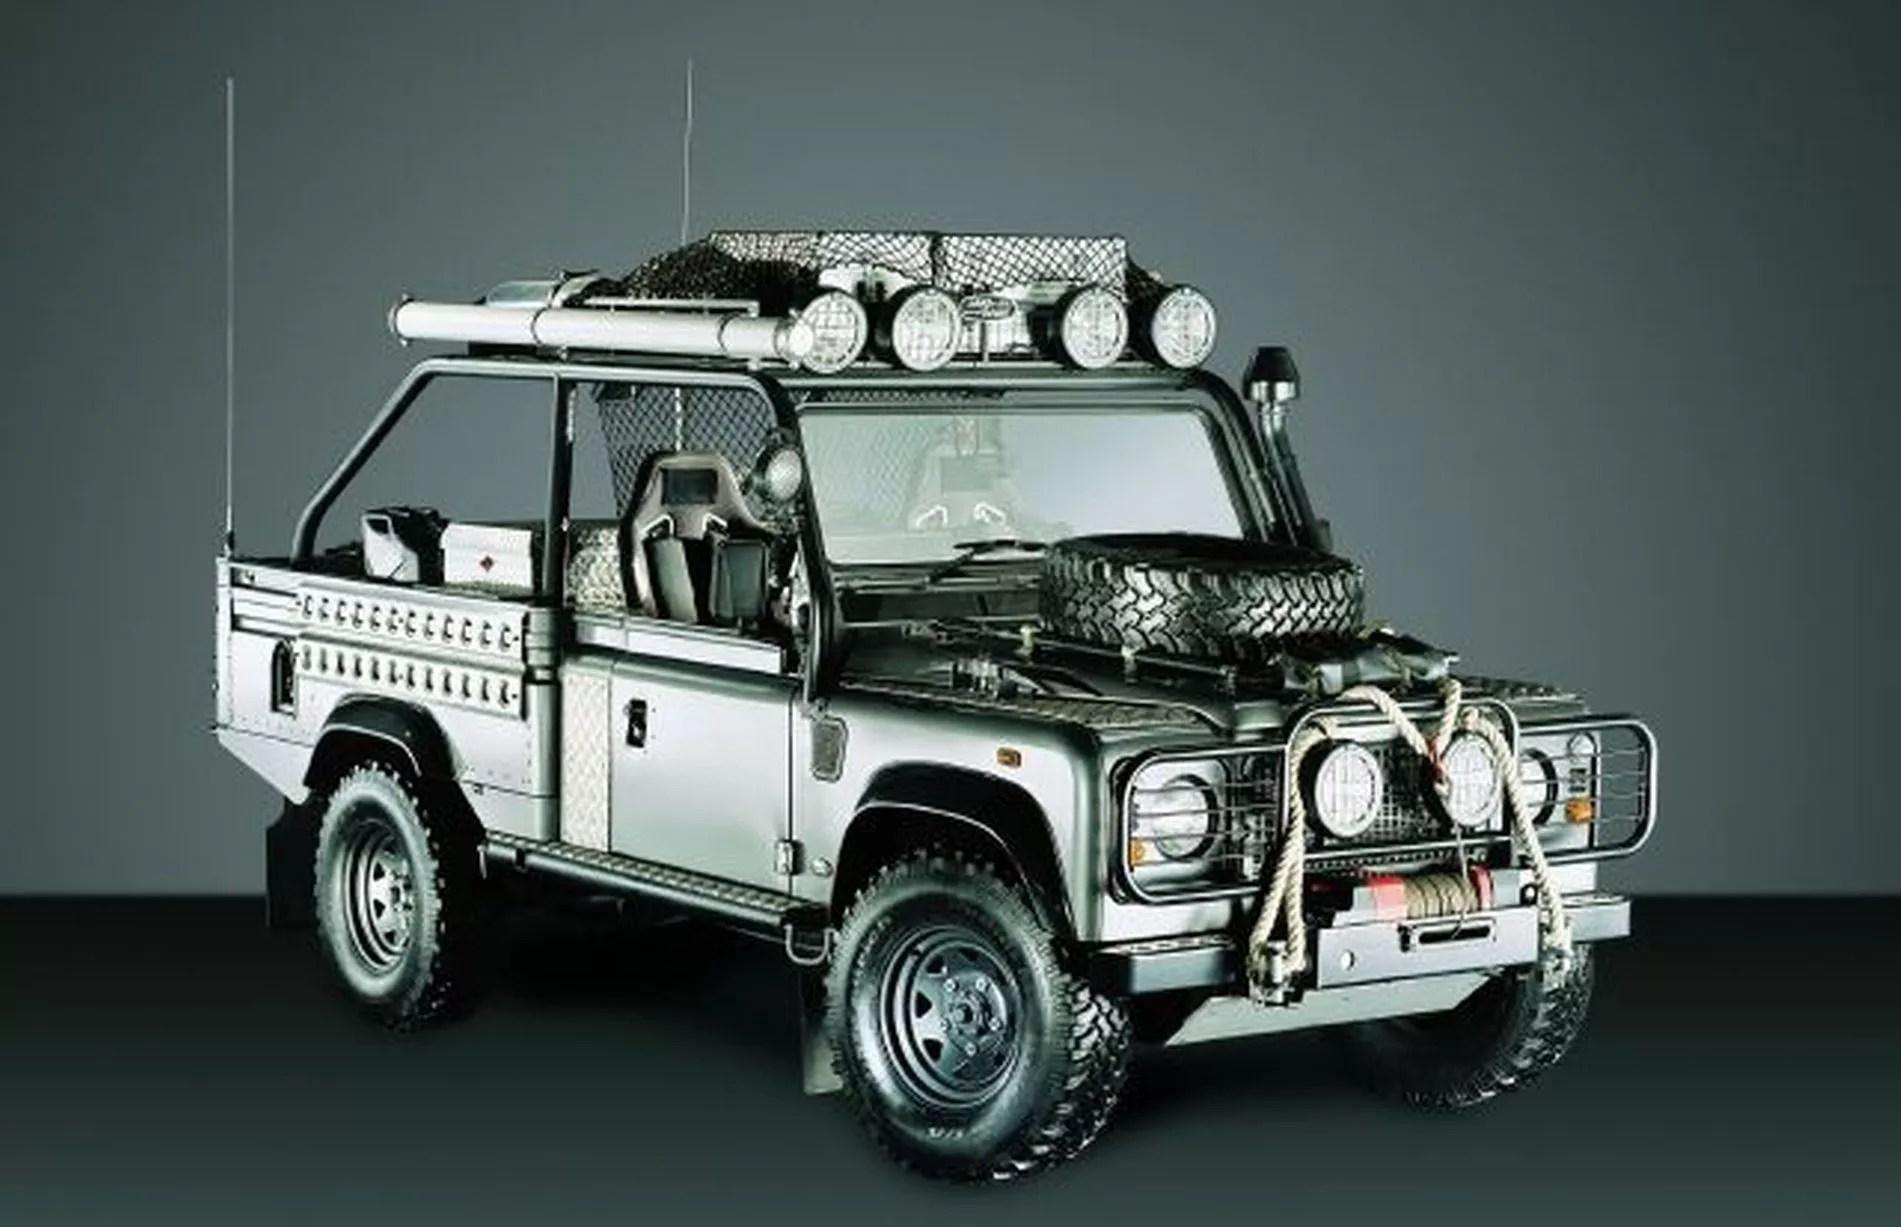 Land Rover Defender Birmingham Mail